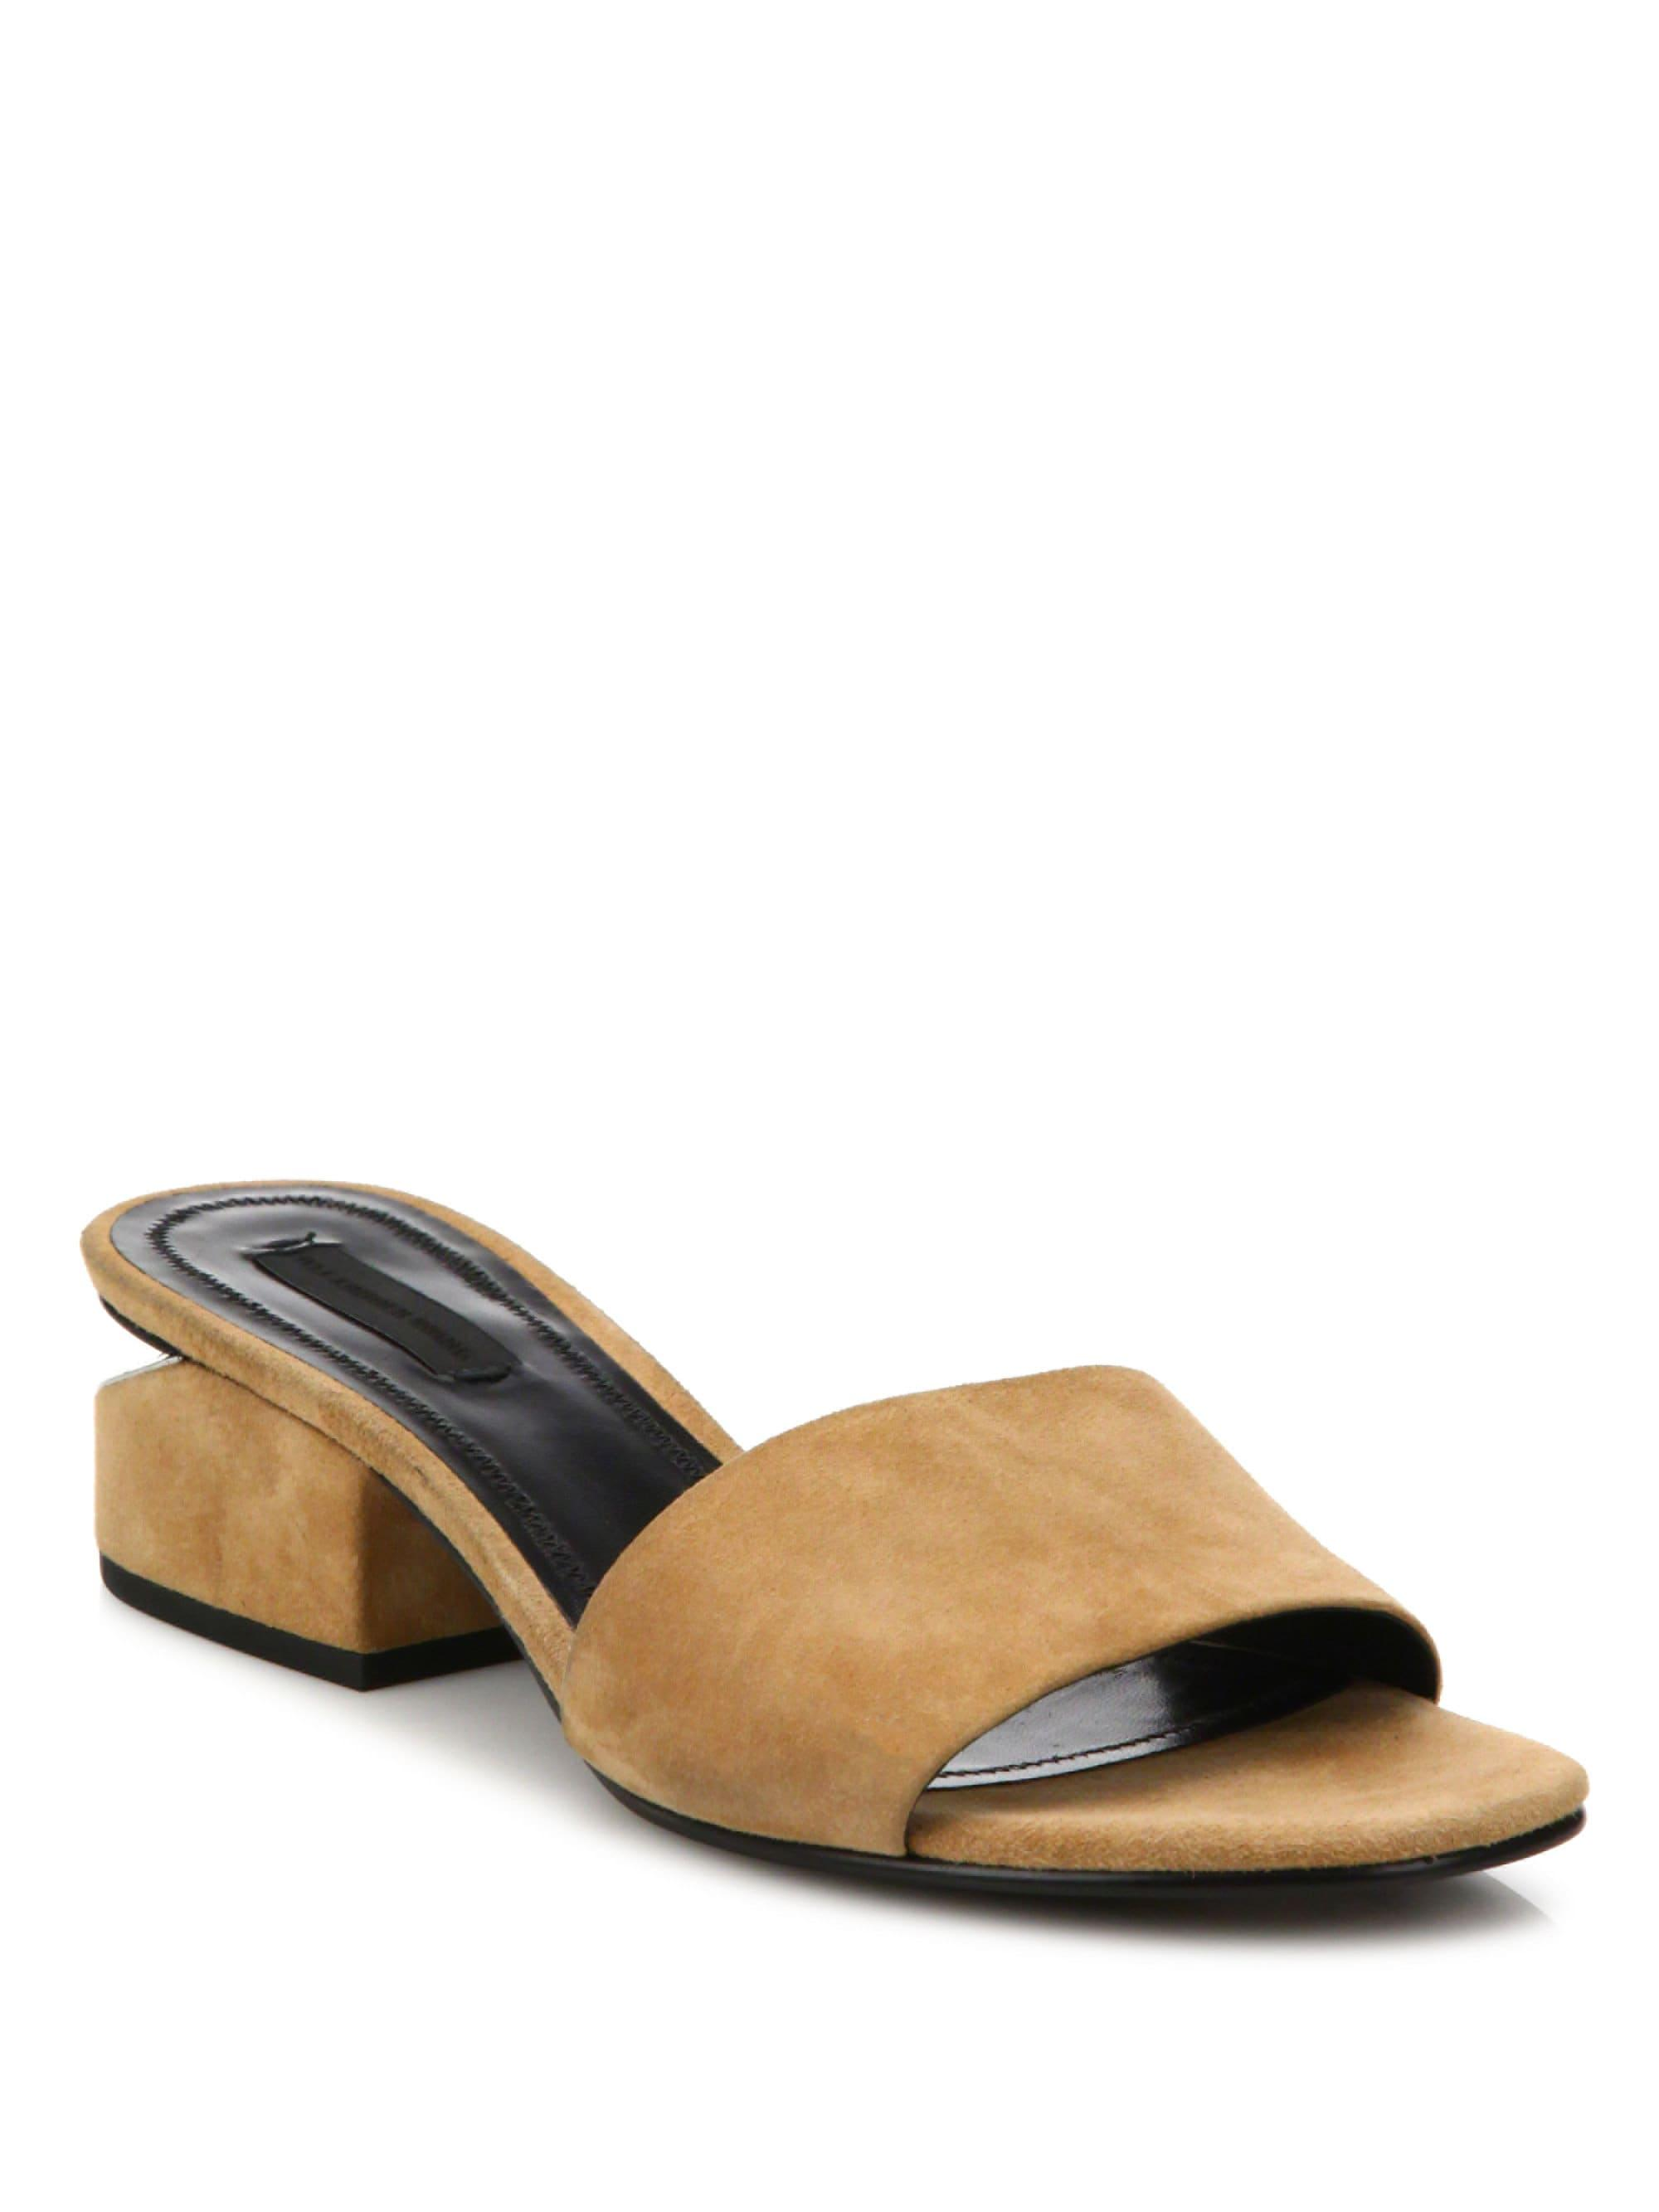 2fc3e276f4a Alexander Wang. Women s Lou Suede Low-heel Slides